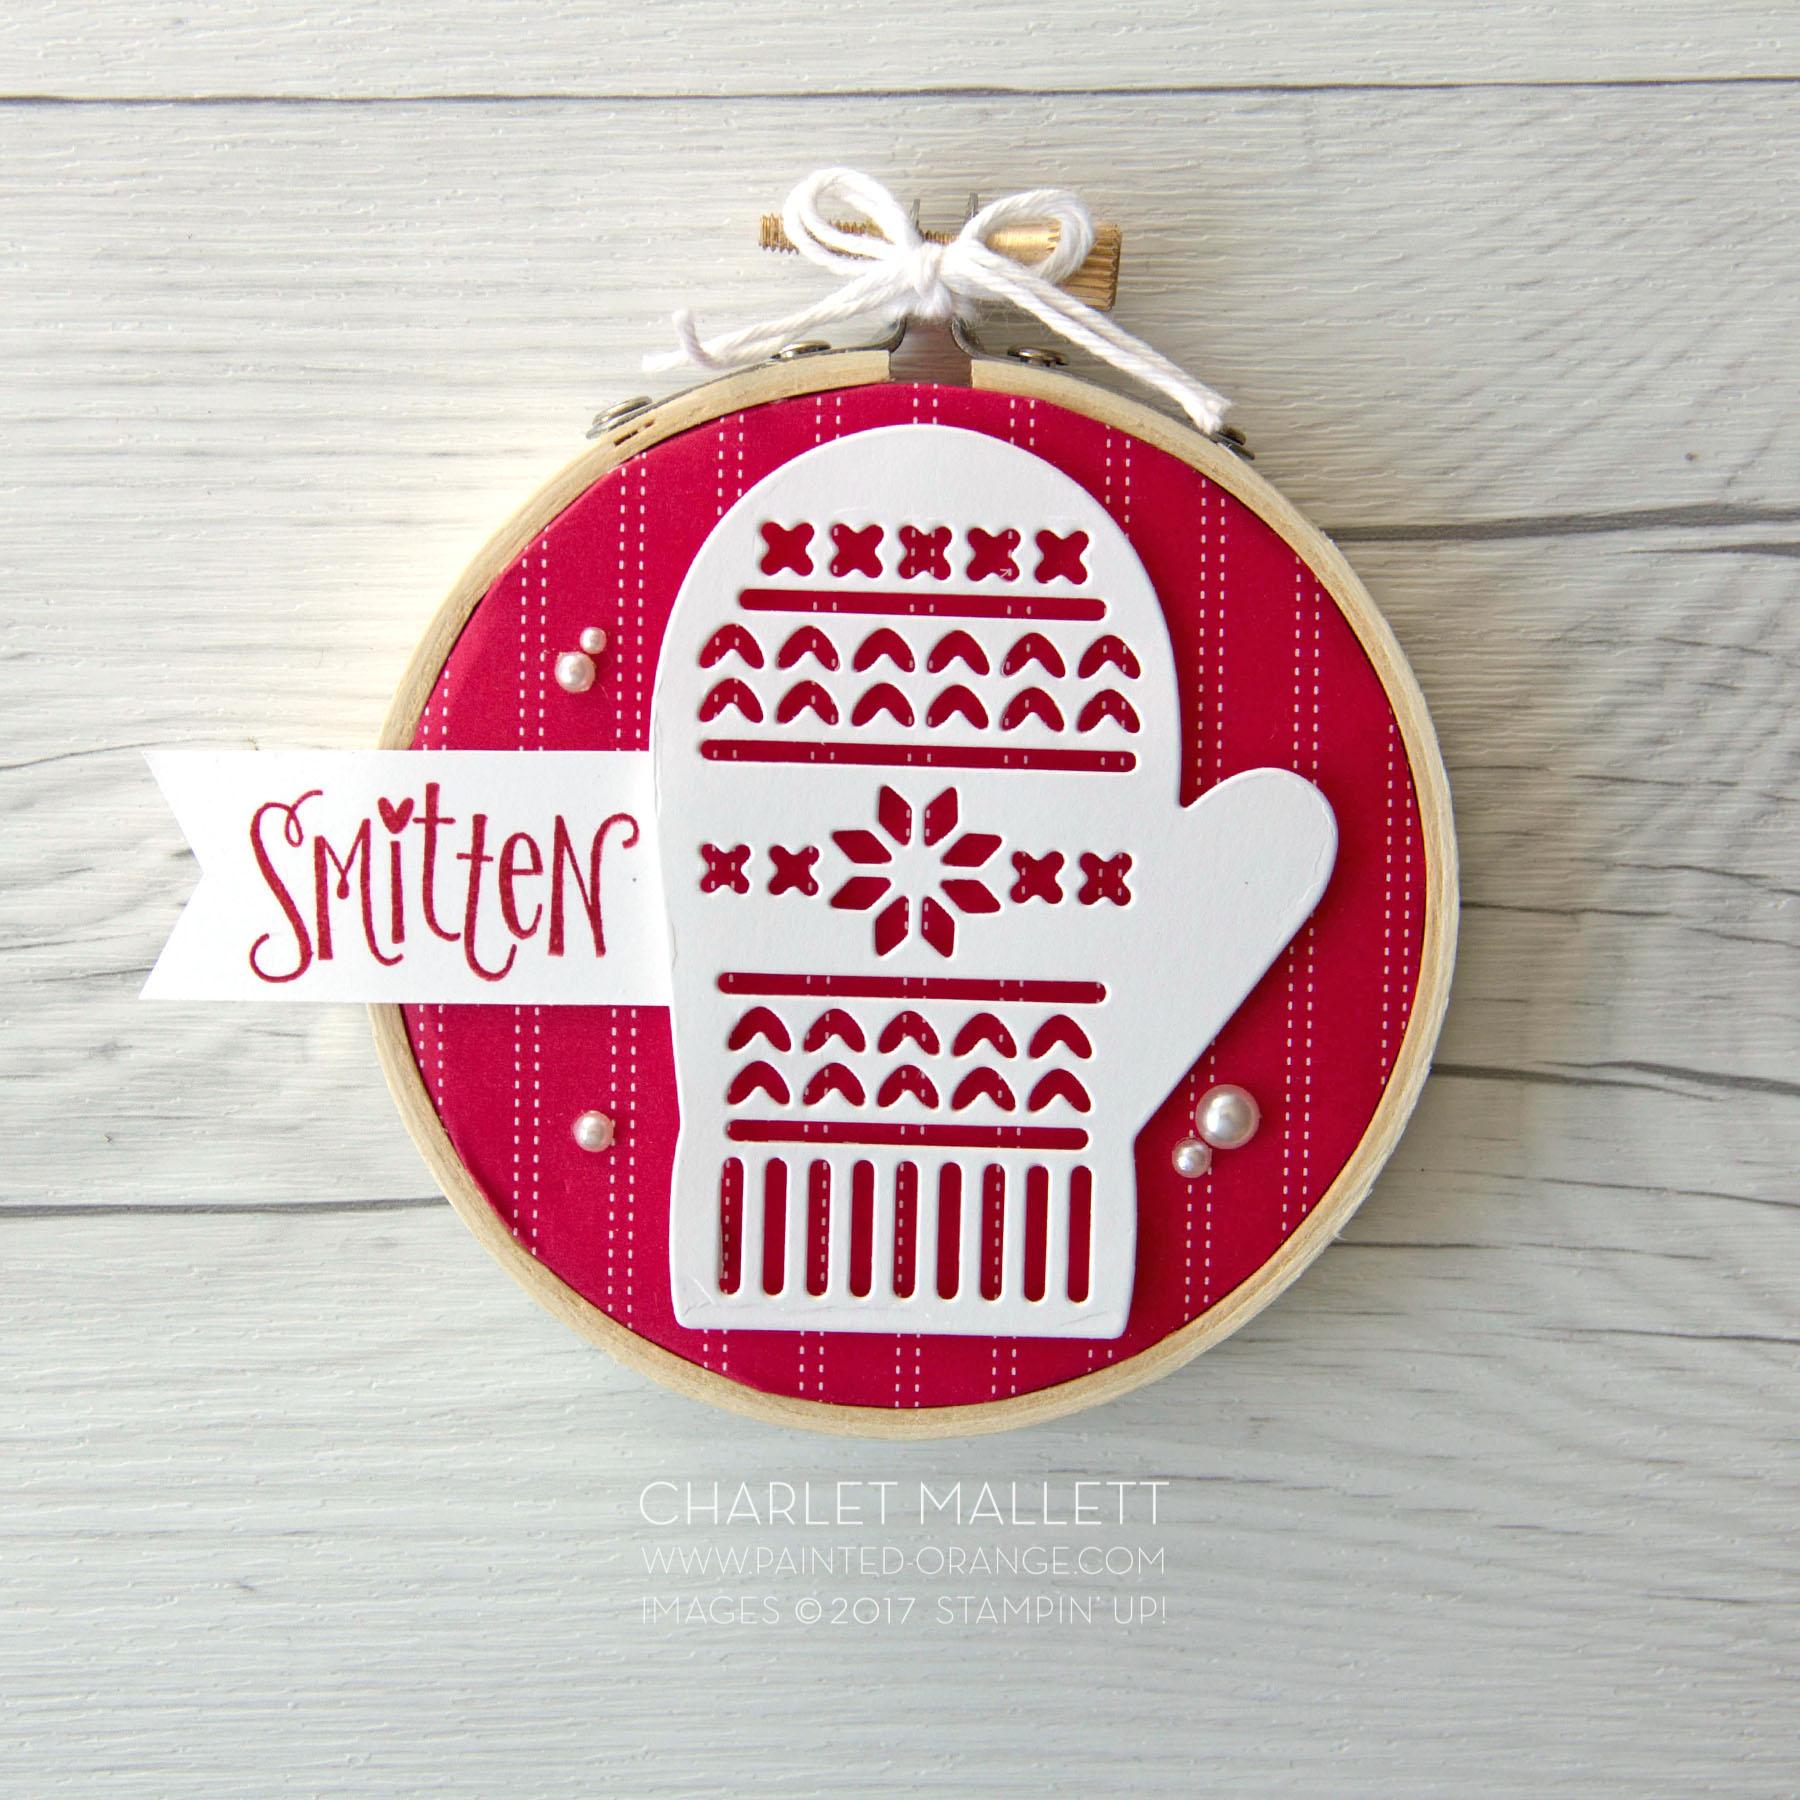 Smitten Mitten Faux cross Stitch Ornament. Charlet Mallett - Stampin' Up!